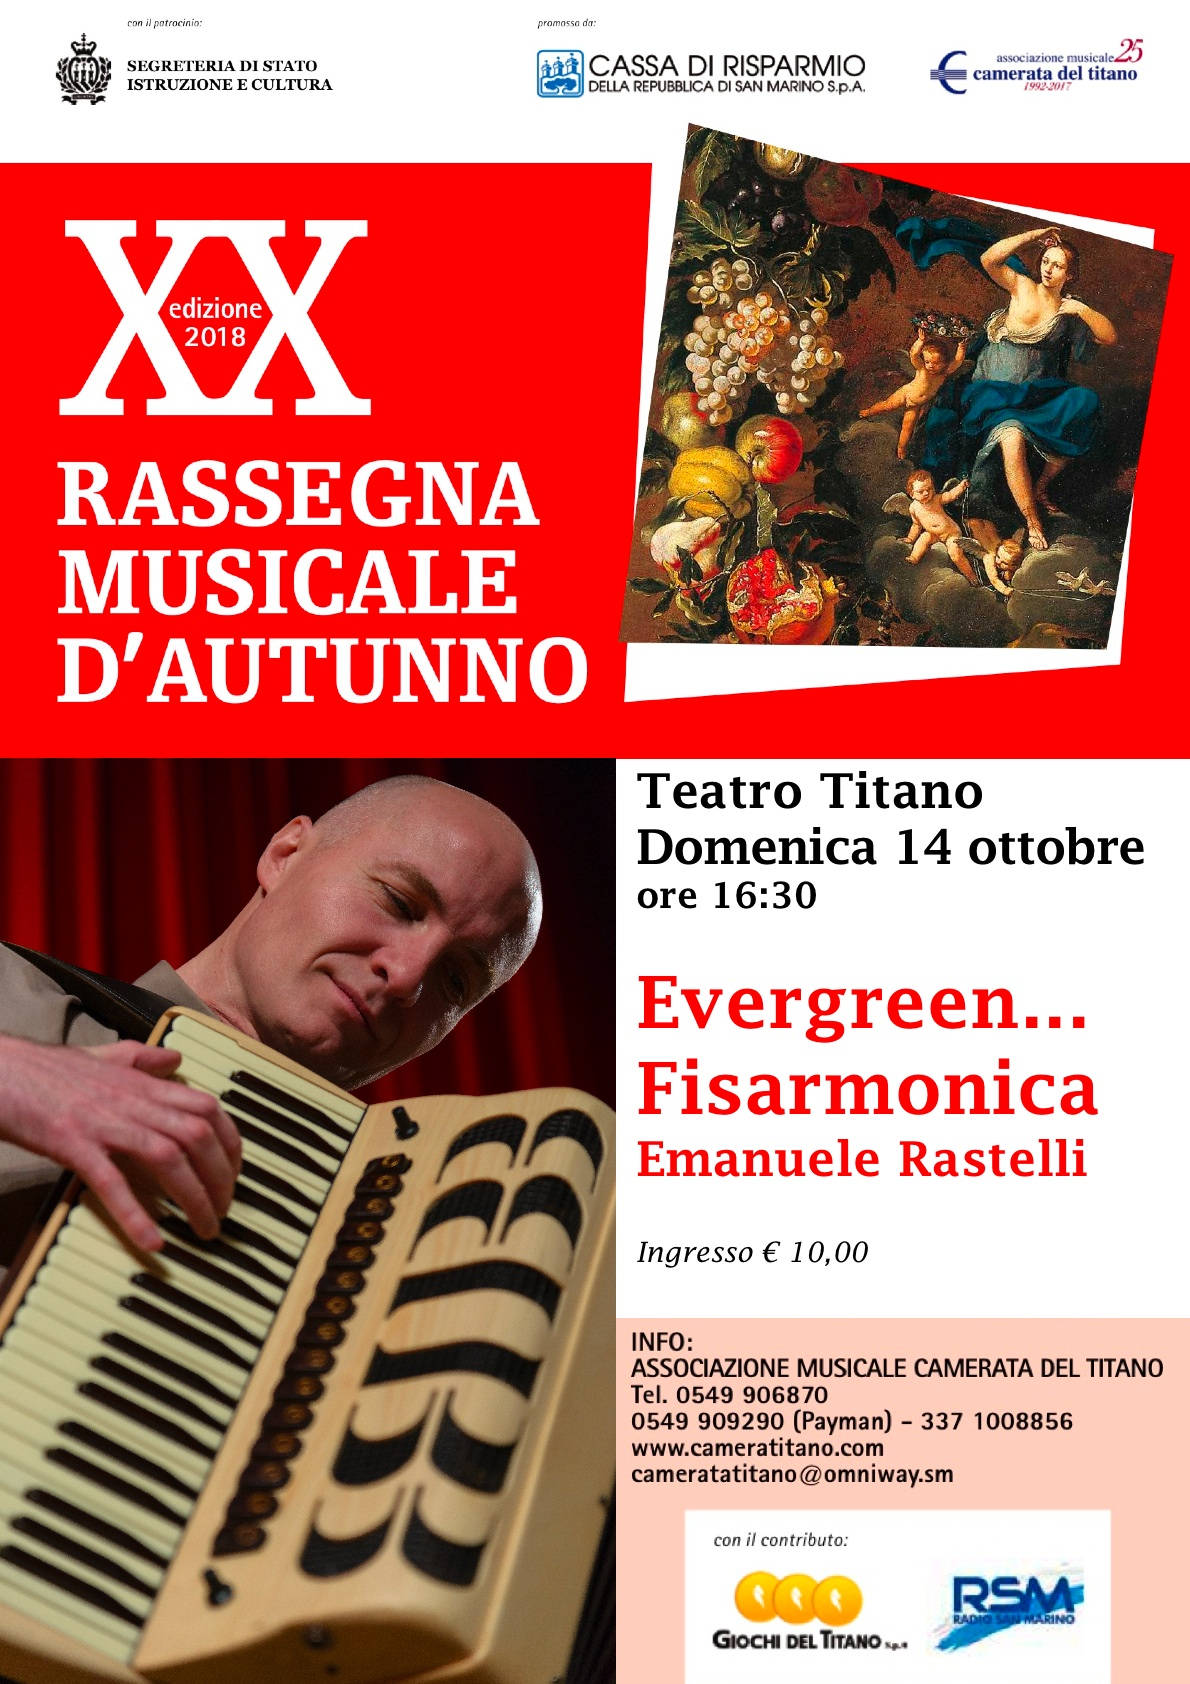 Evergreen fisarmonica… con Emanuele Rastelli